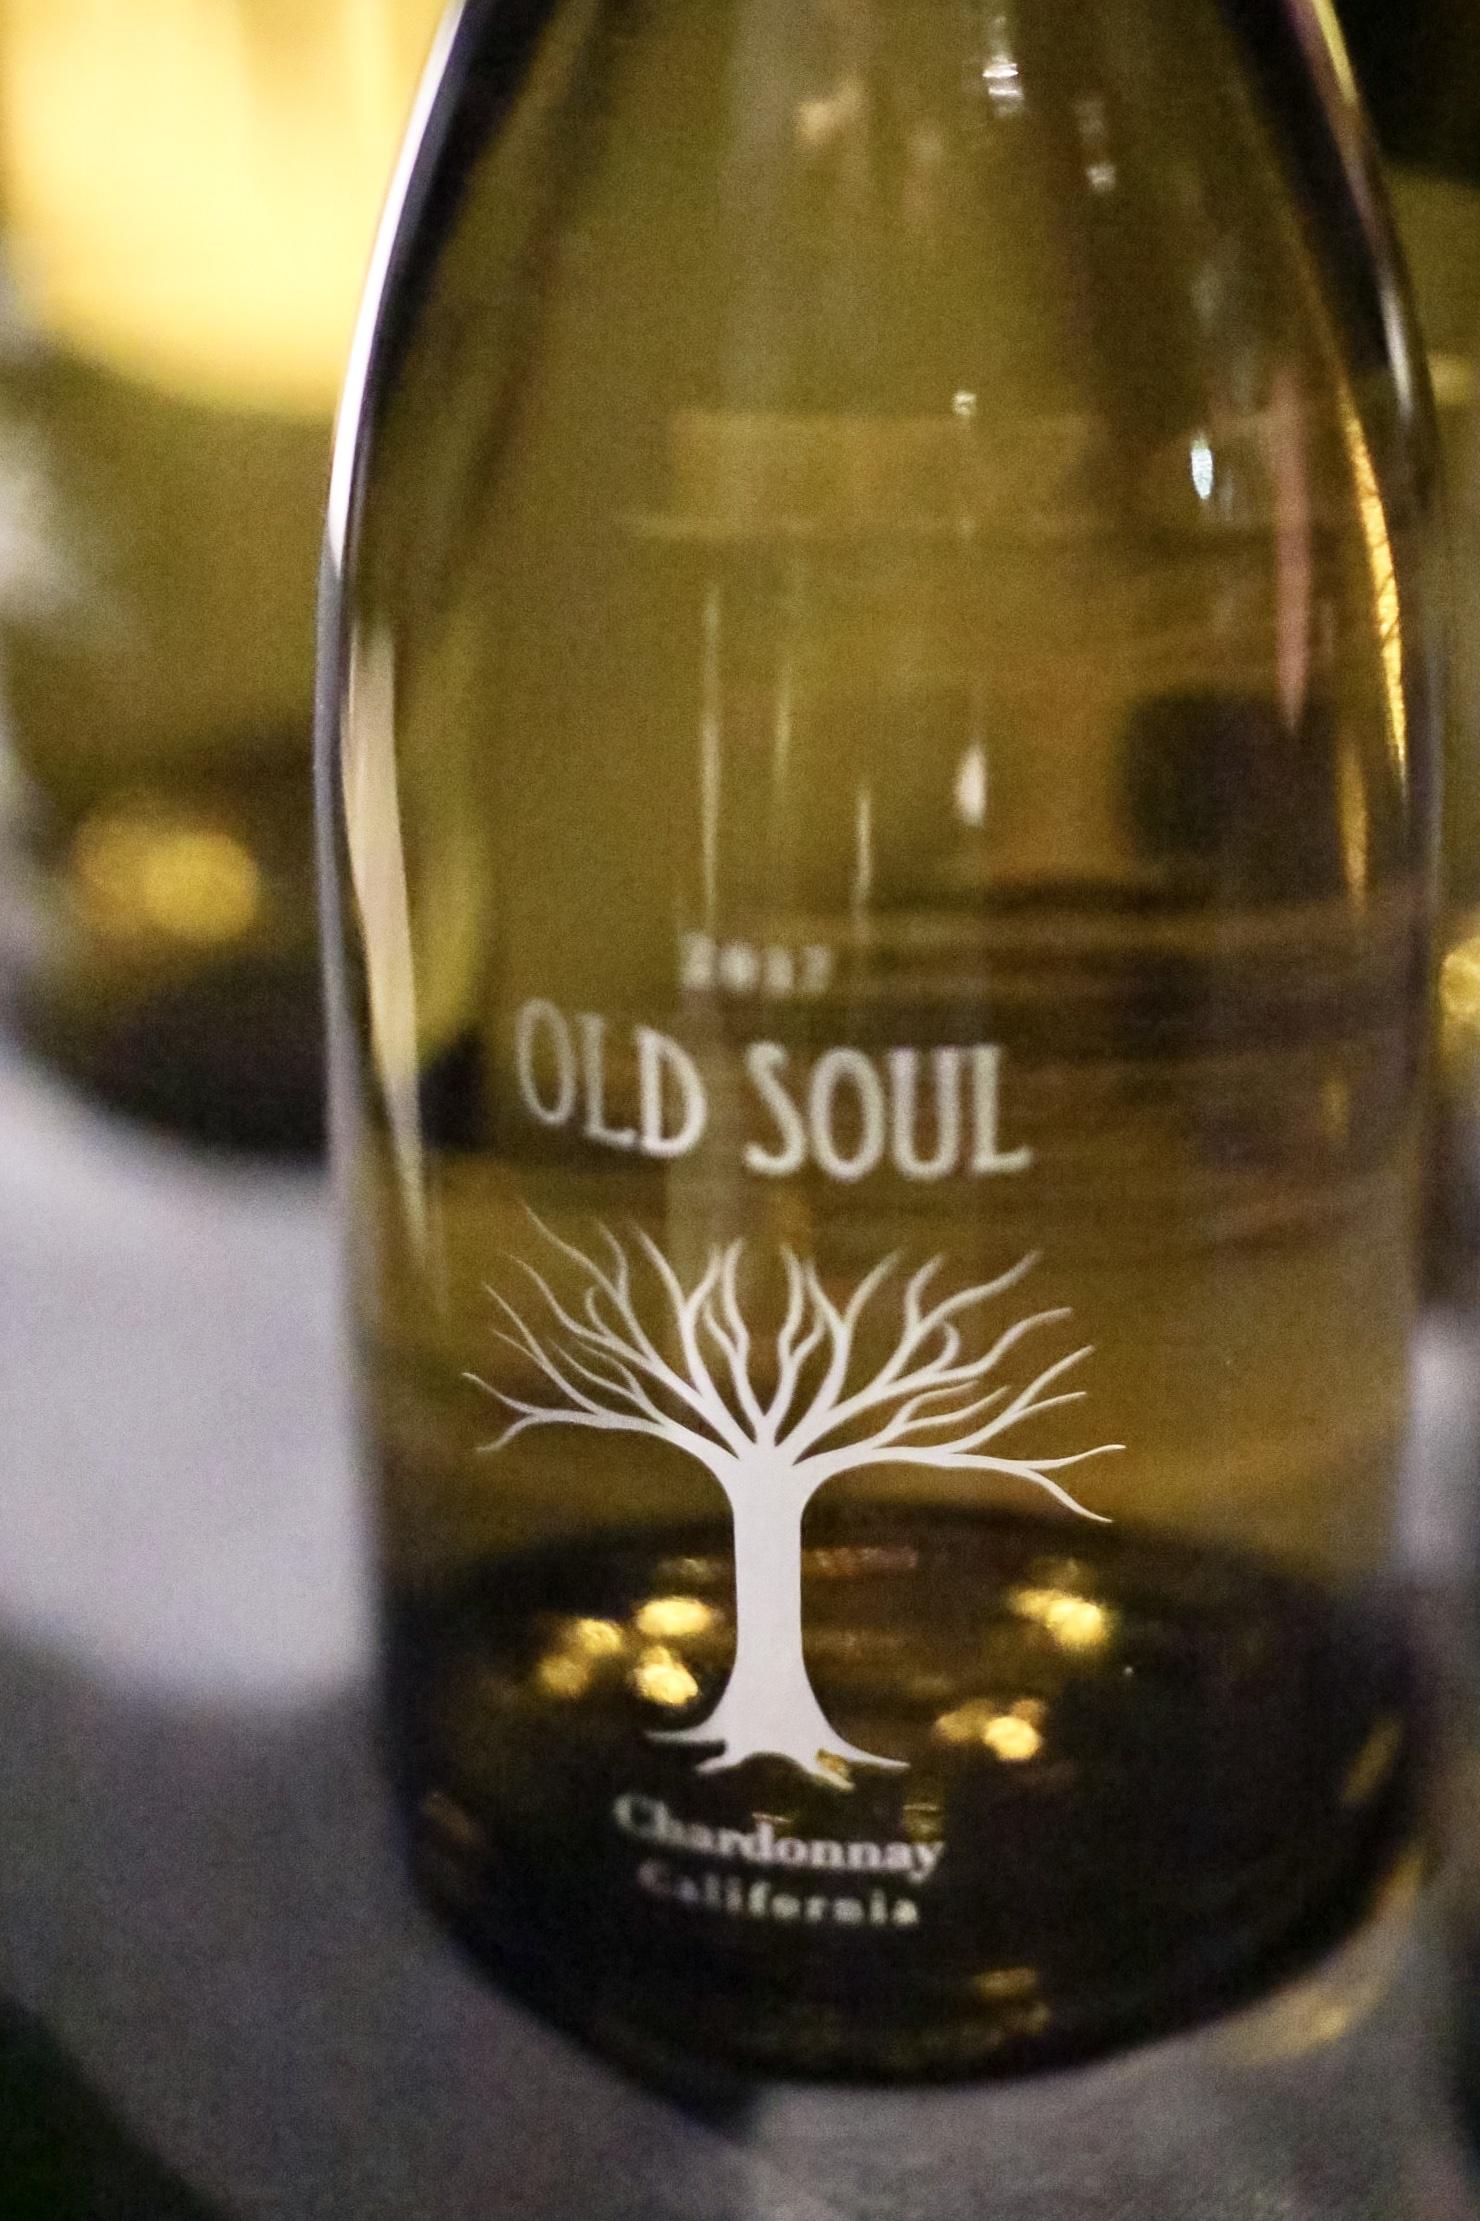 Old Soul Chardonnay 2017